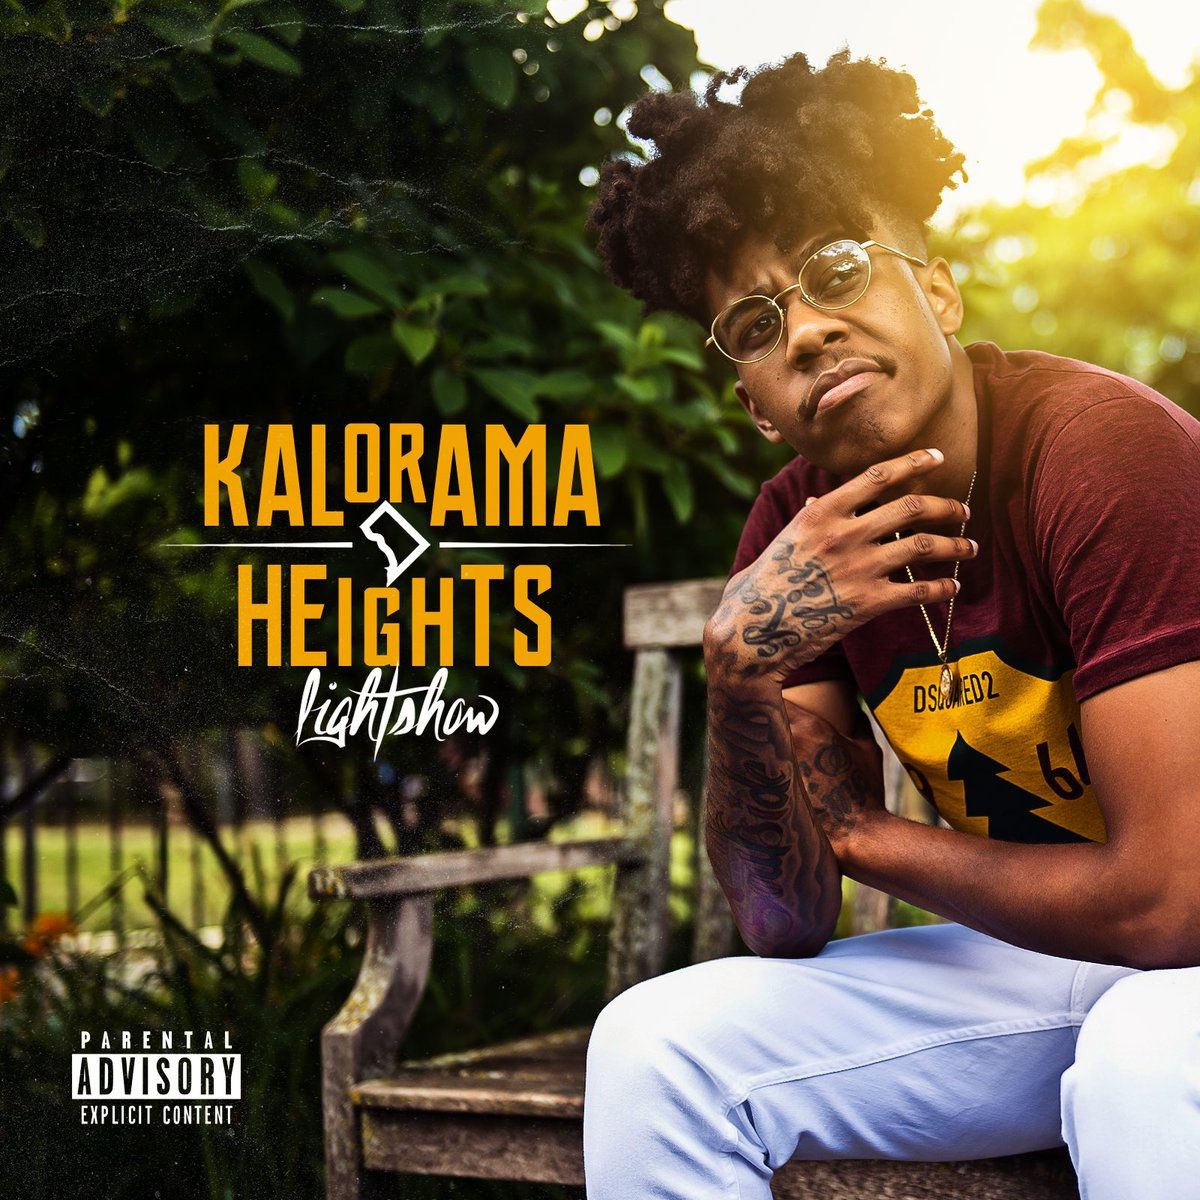 lightshow kalorama heights